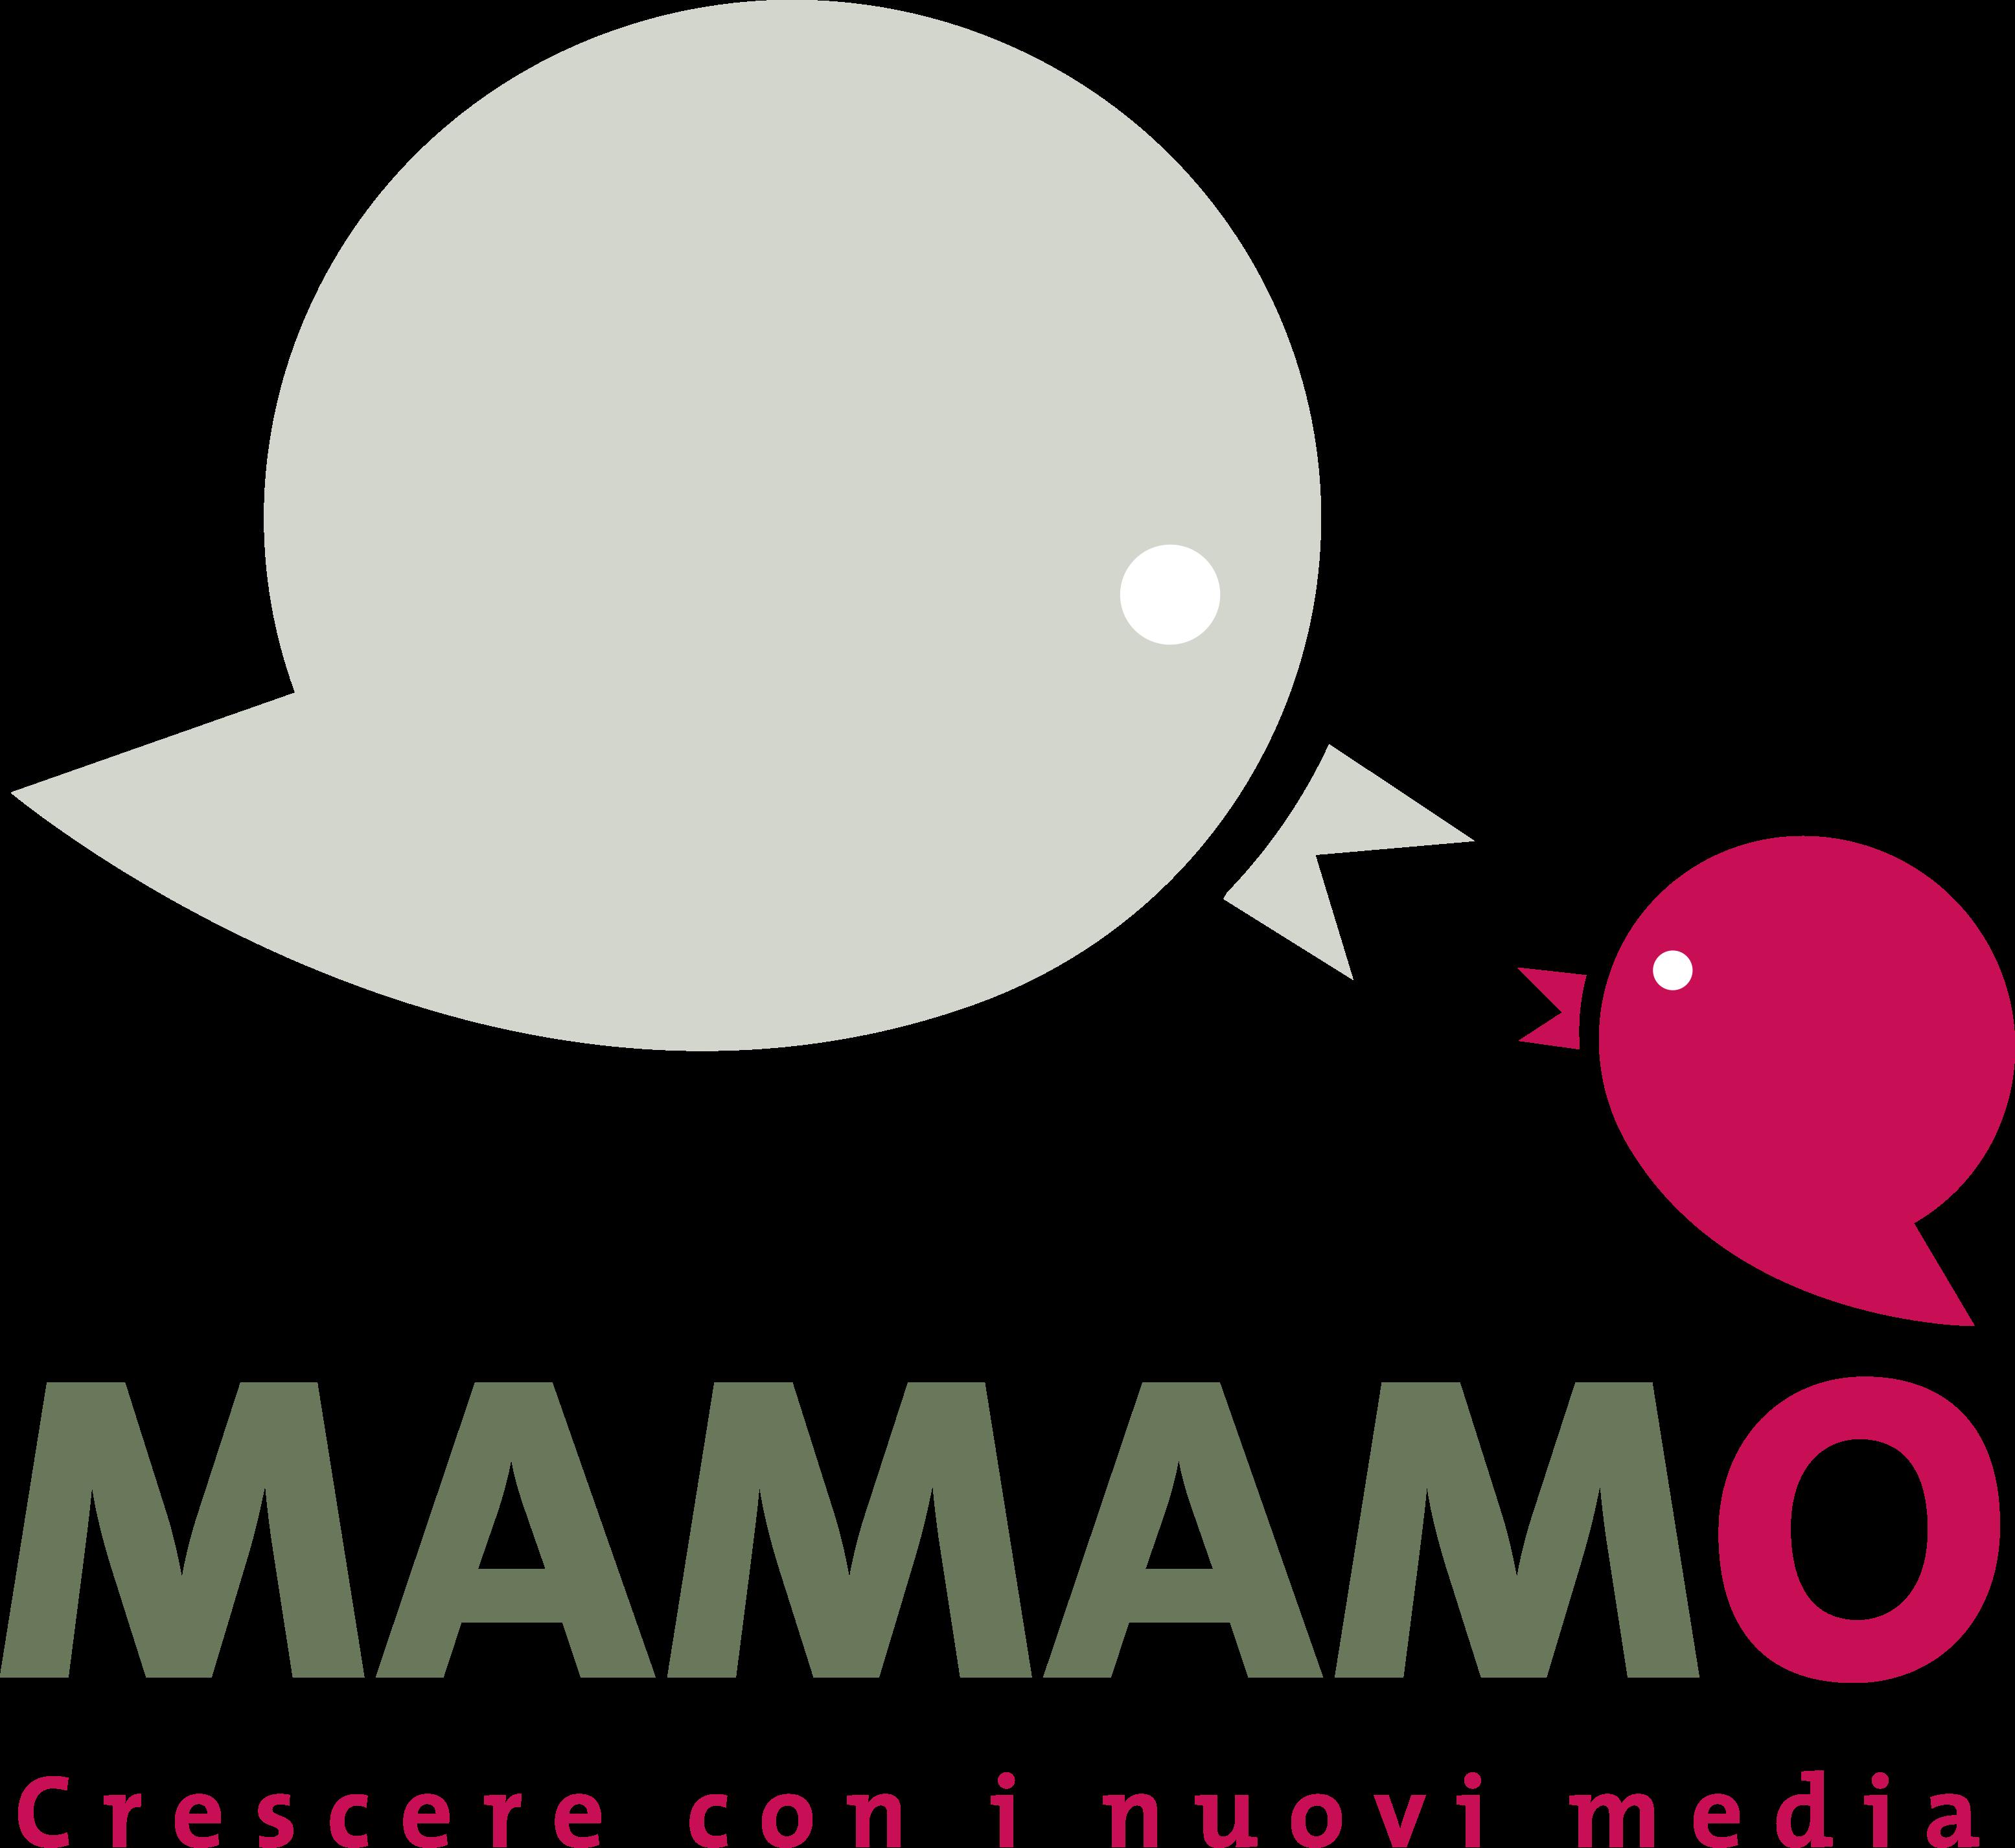 mamamo_logo